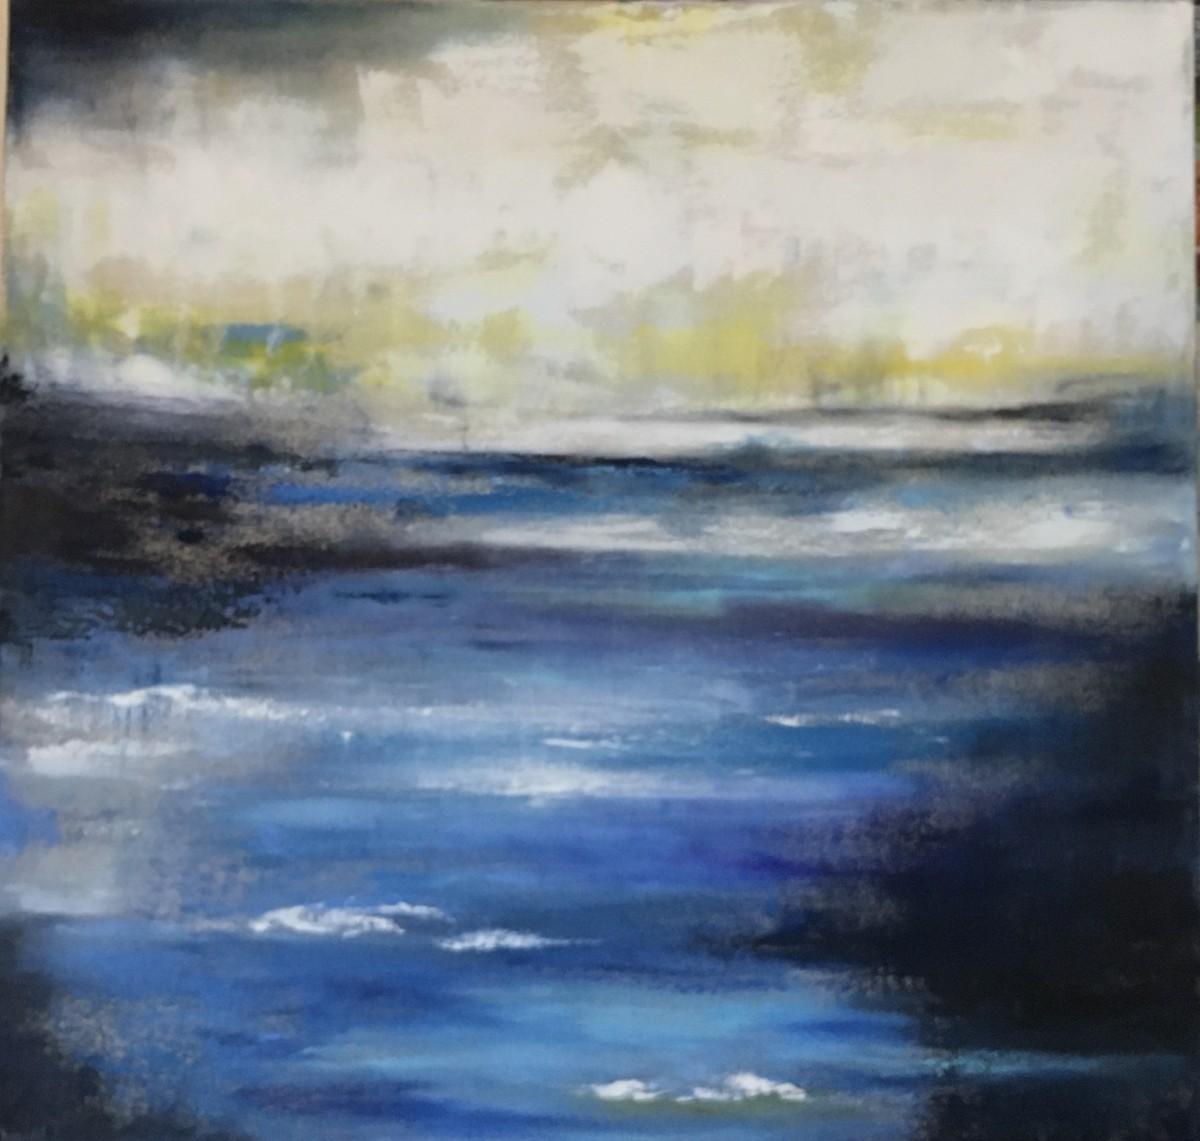 Leandler Lagoon by Ansley Pye